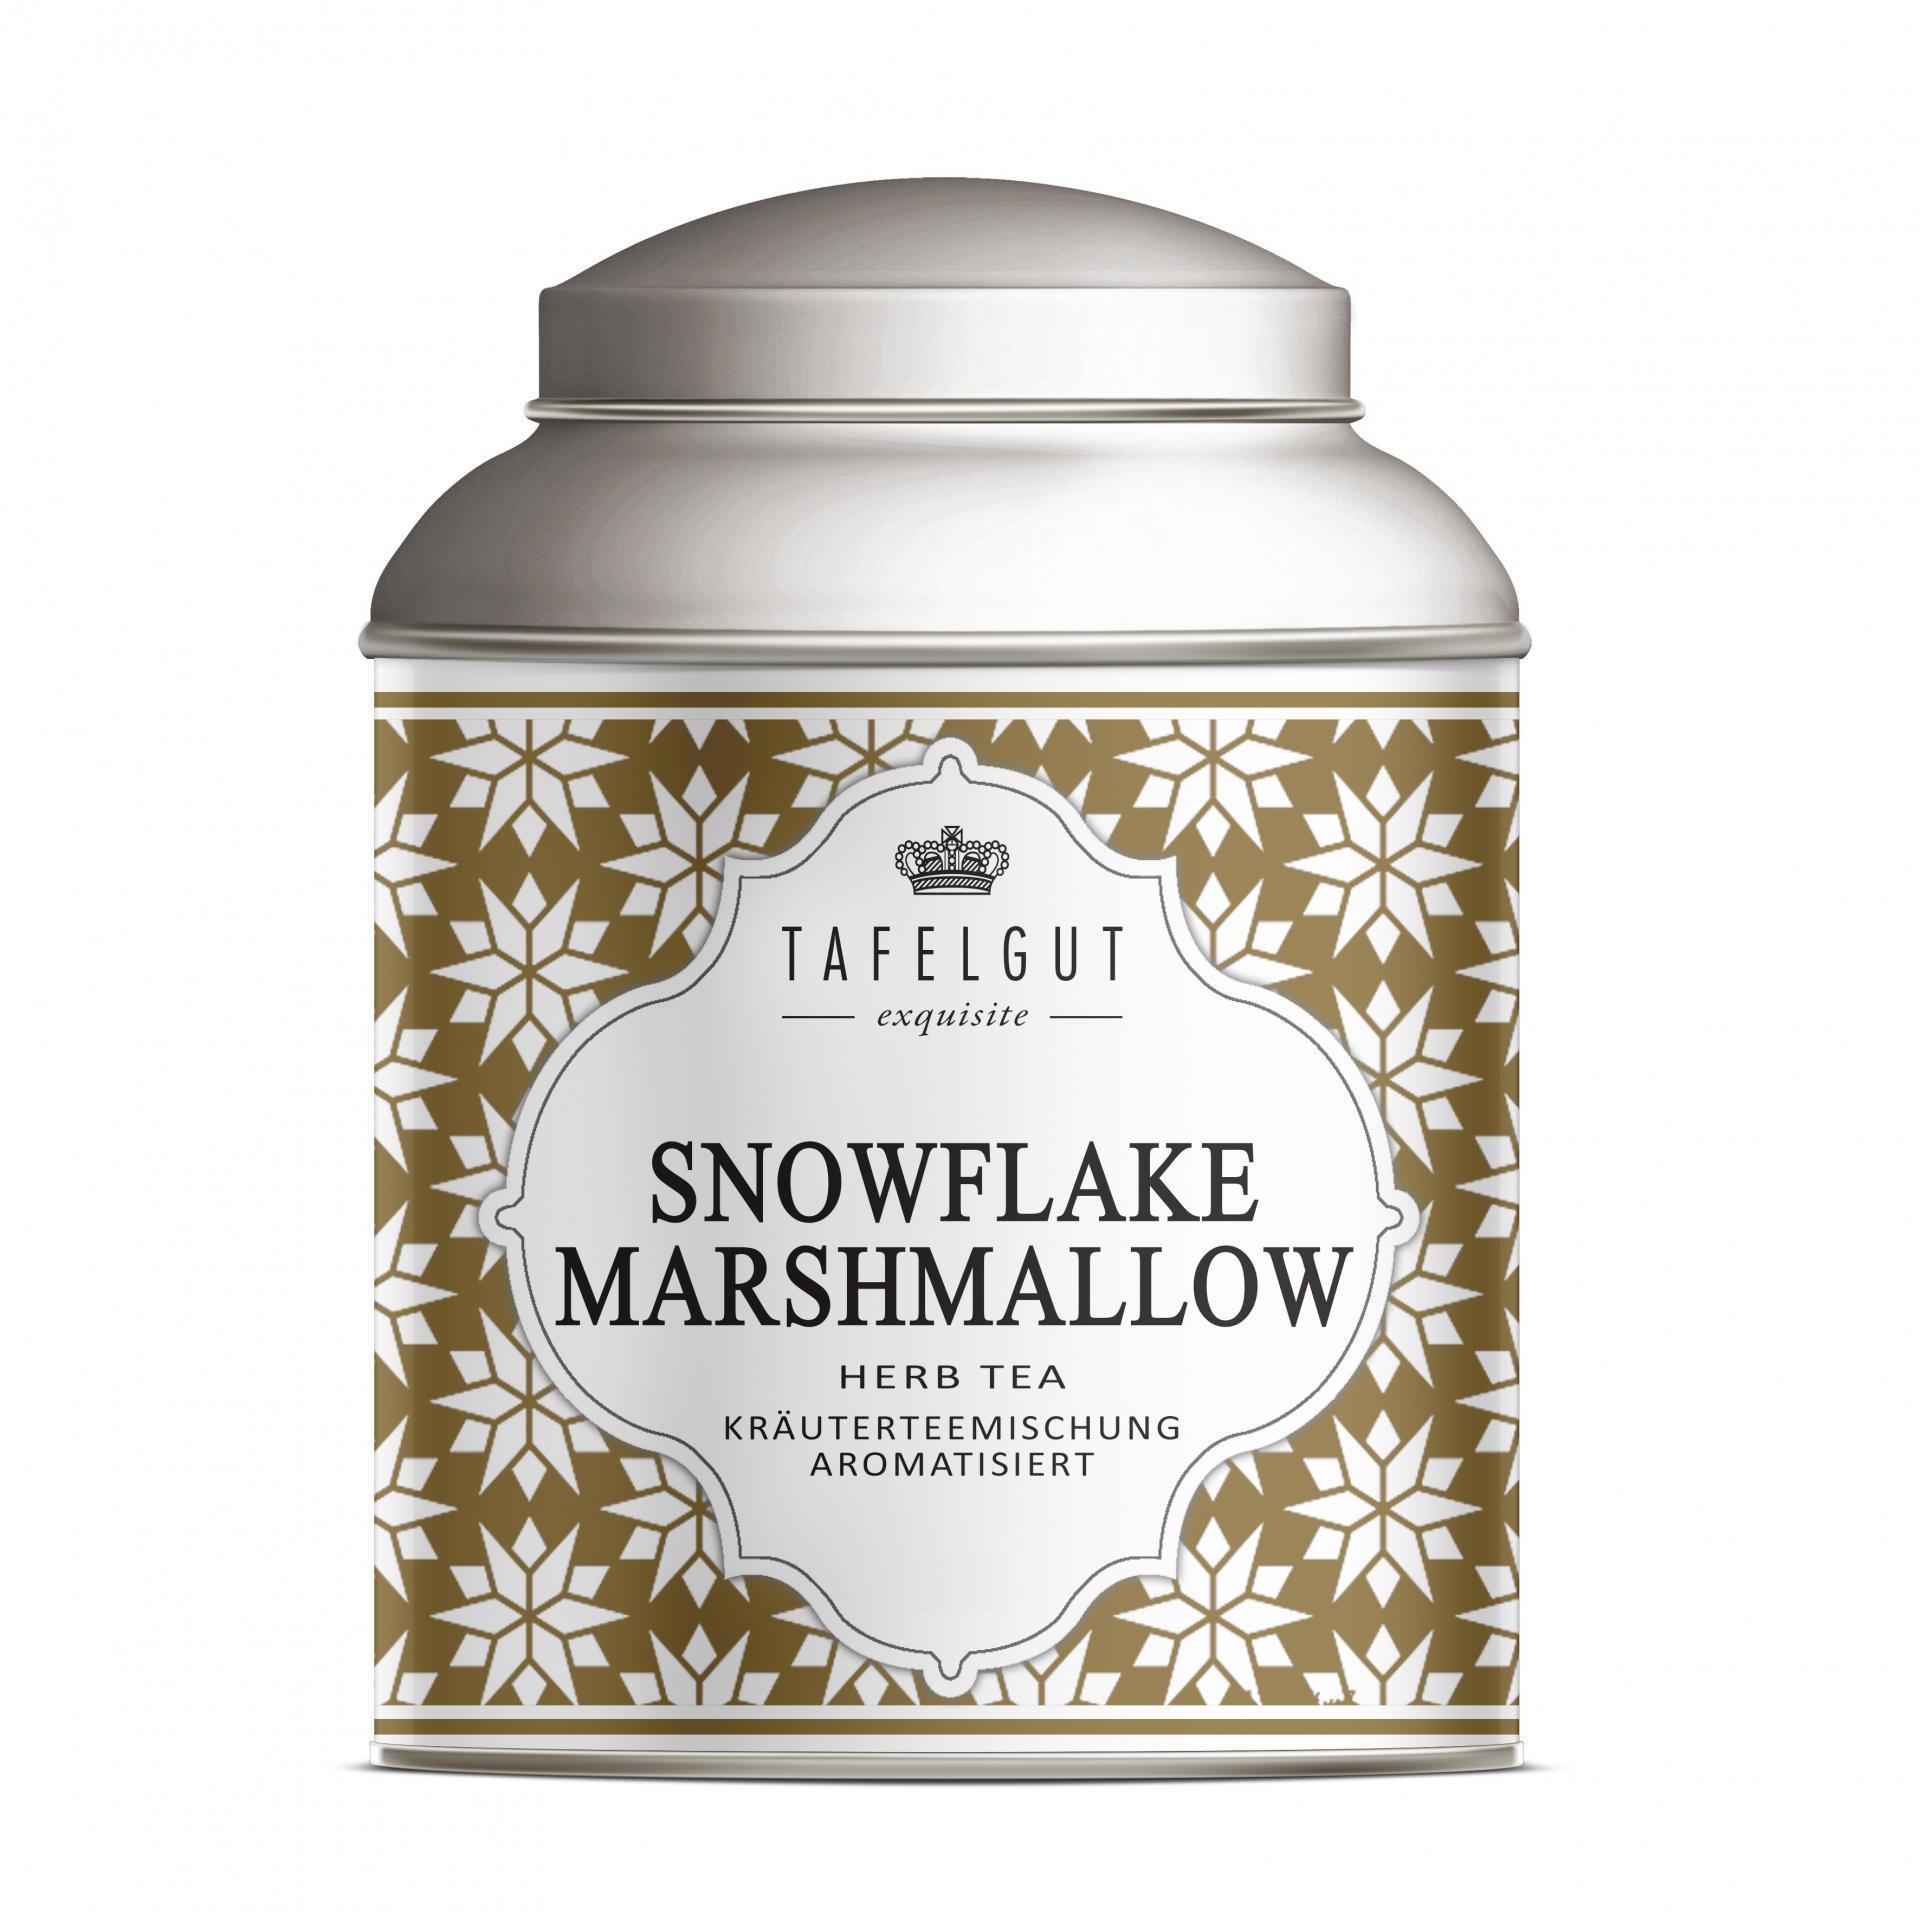 TAFELGUT Mini bylinný čaj Snowflake Marshmallow - 25gr, měděná barva, kov